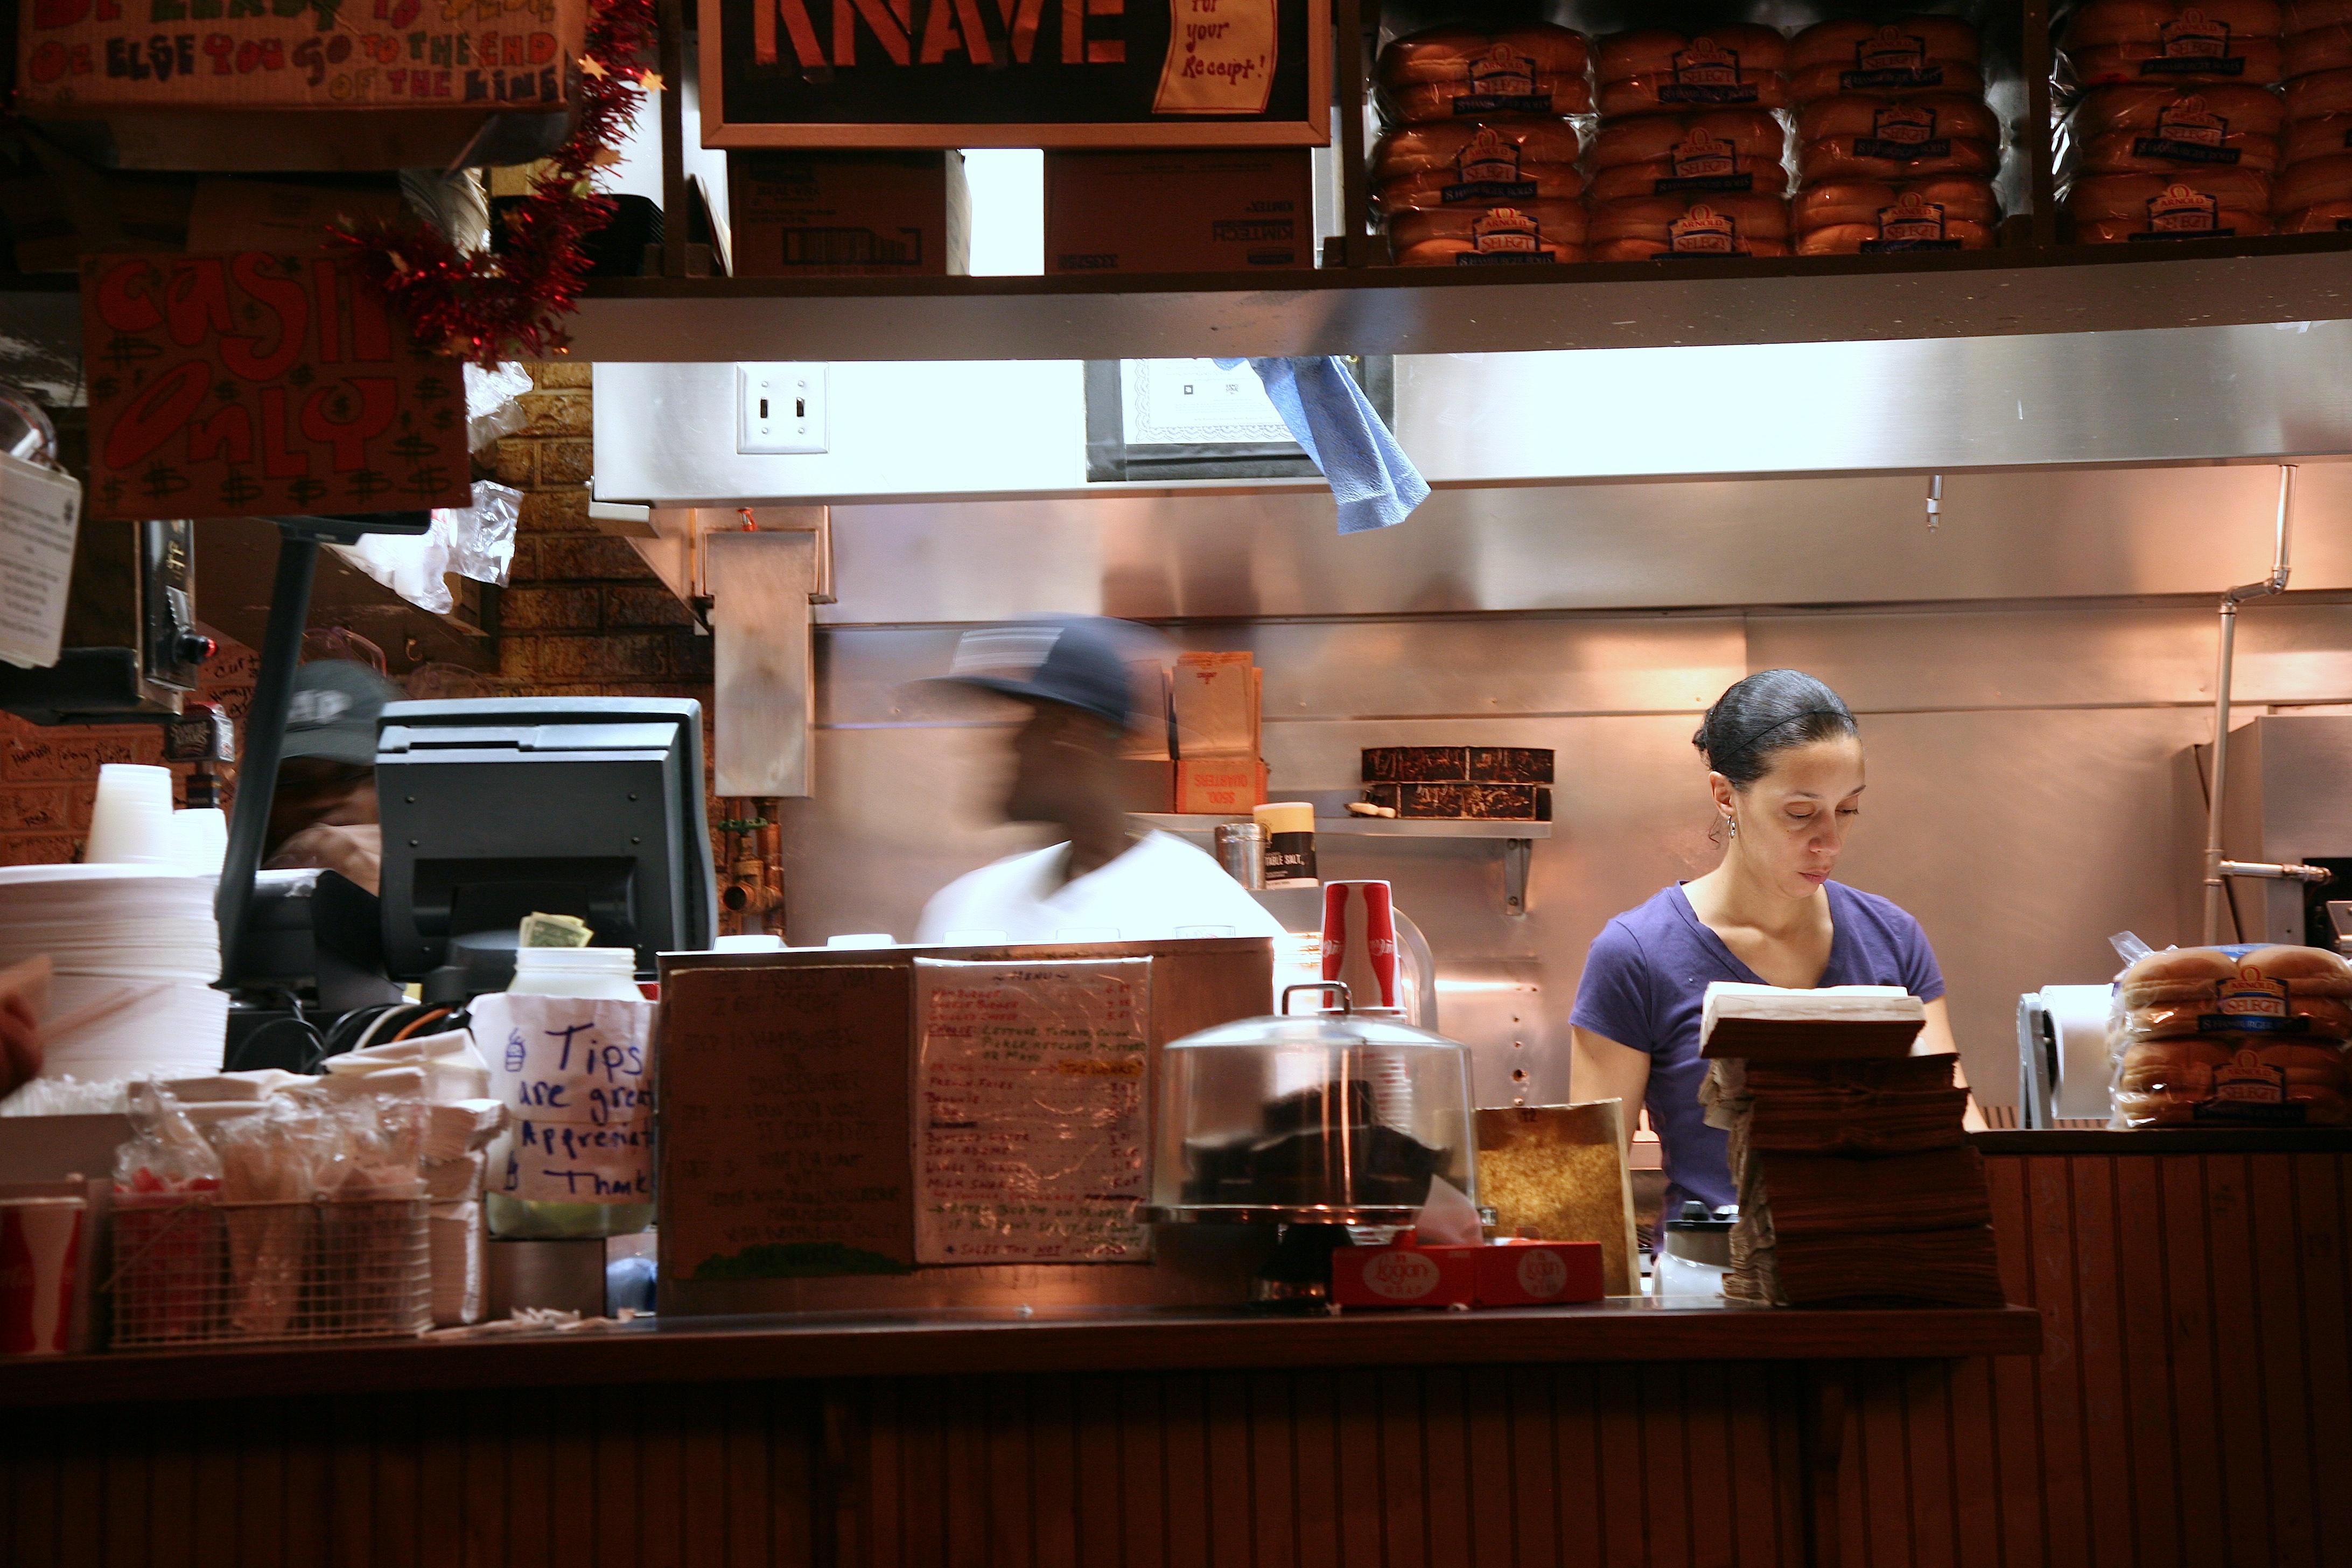 Fotos gratis : restaurante, Manhattan, bar, Nueva York, cocina ...